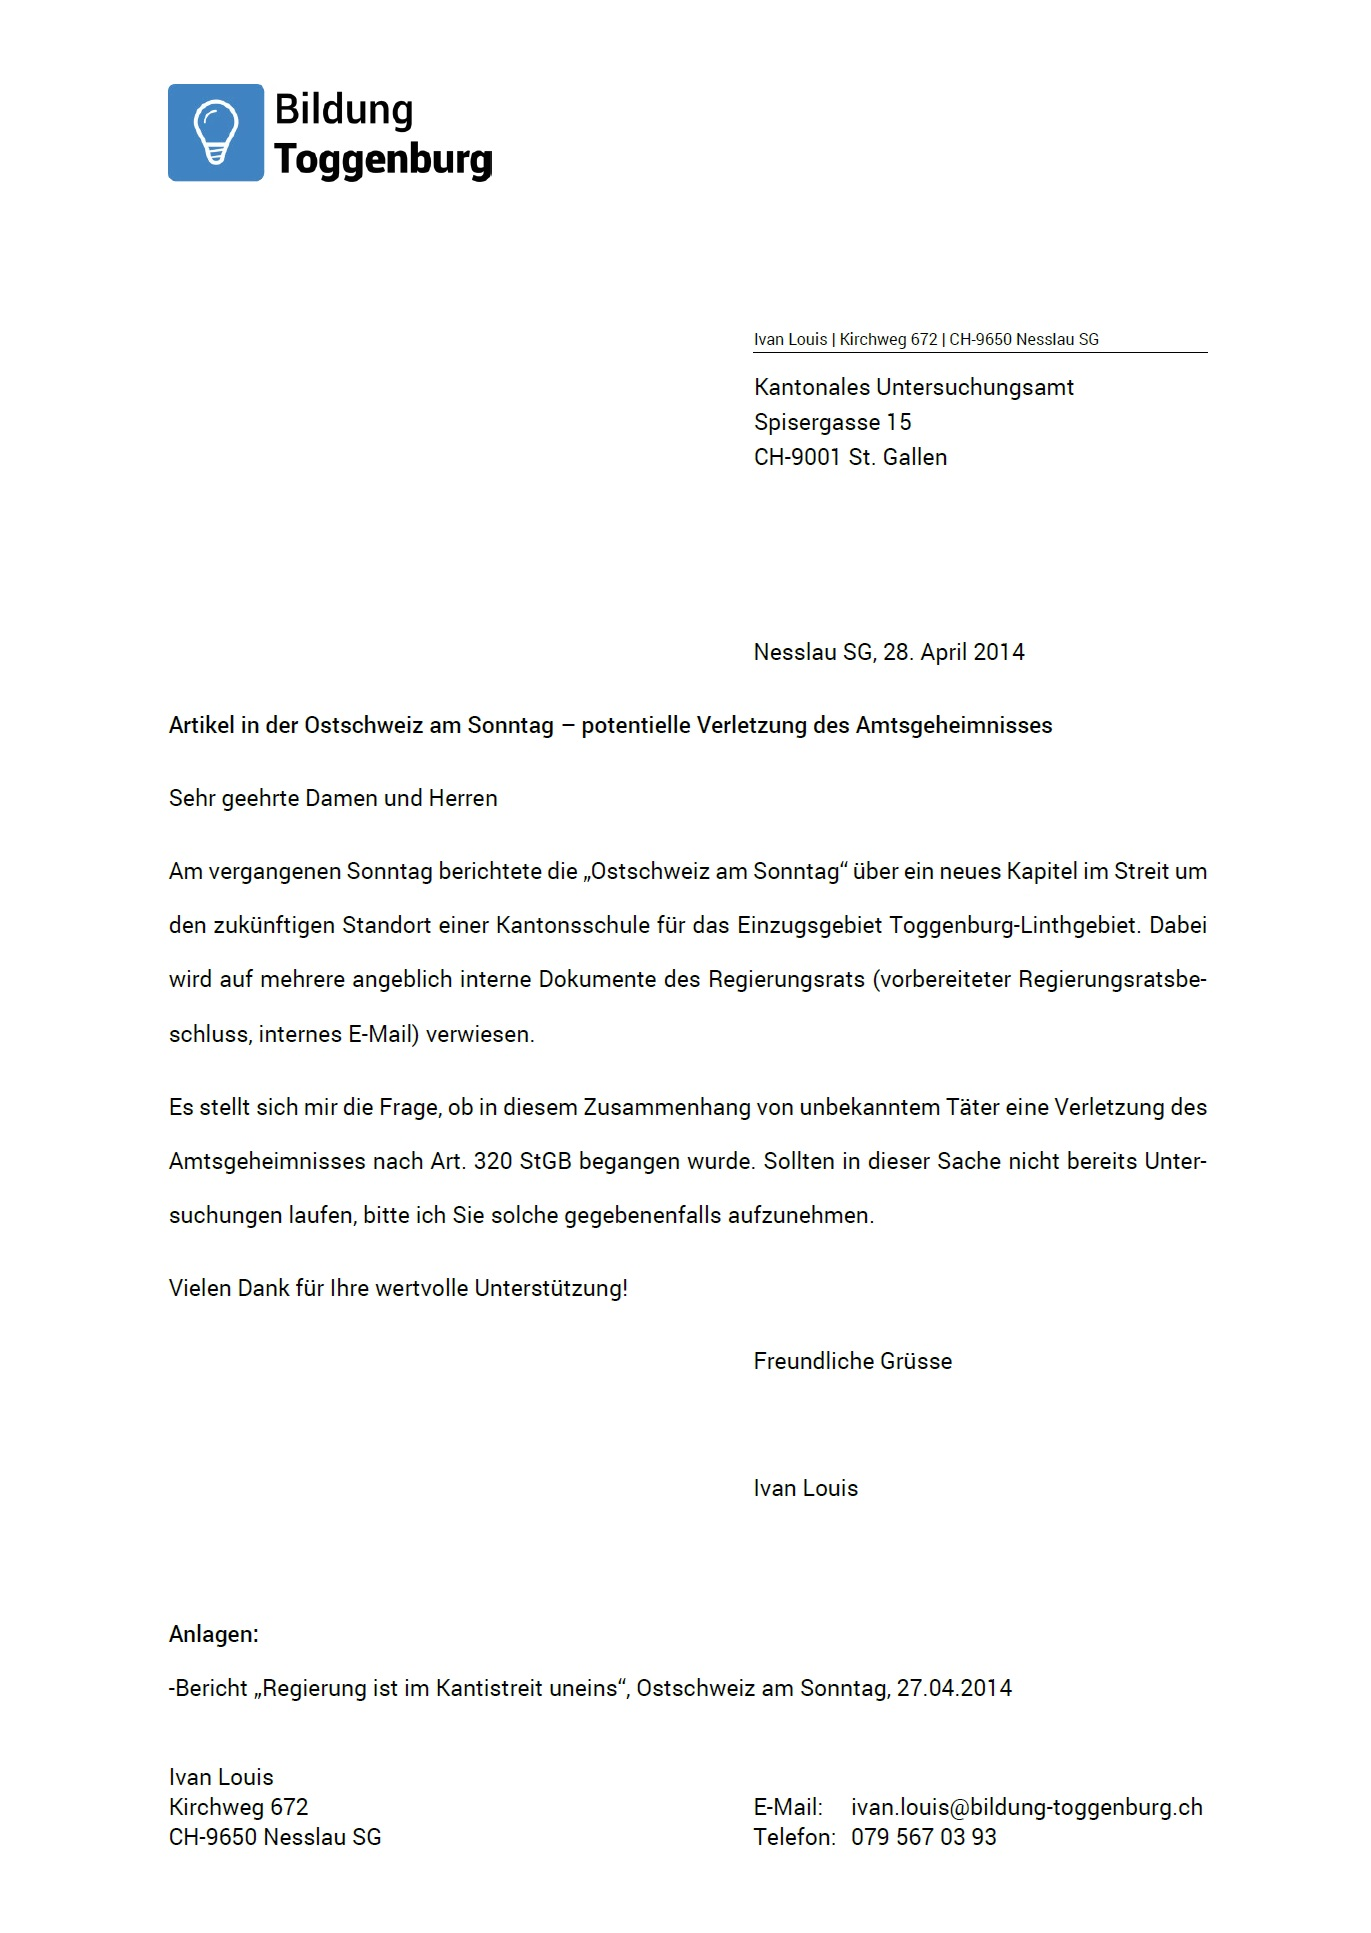 Potentielle Verletzung des Amtsgeheimnisses (Montag, 28.04.2014)